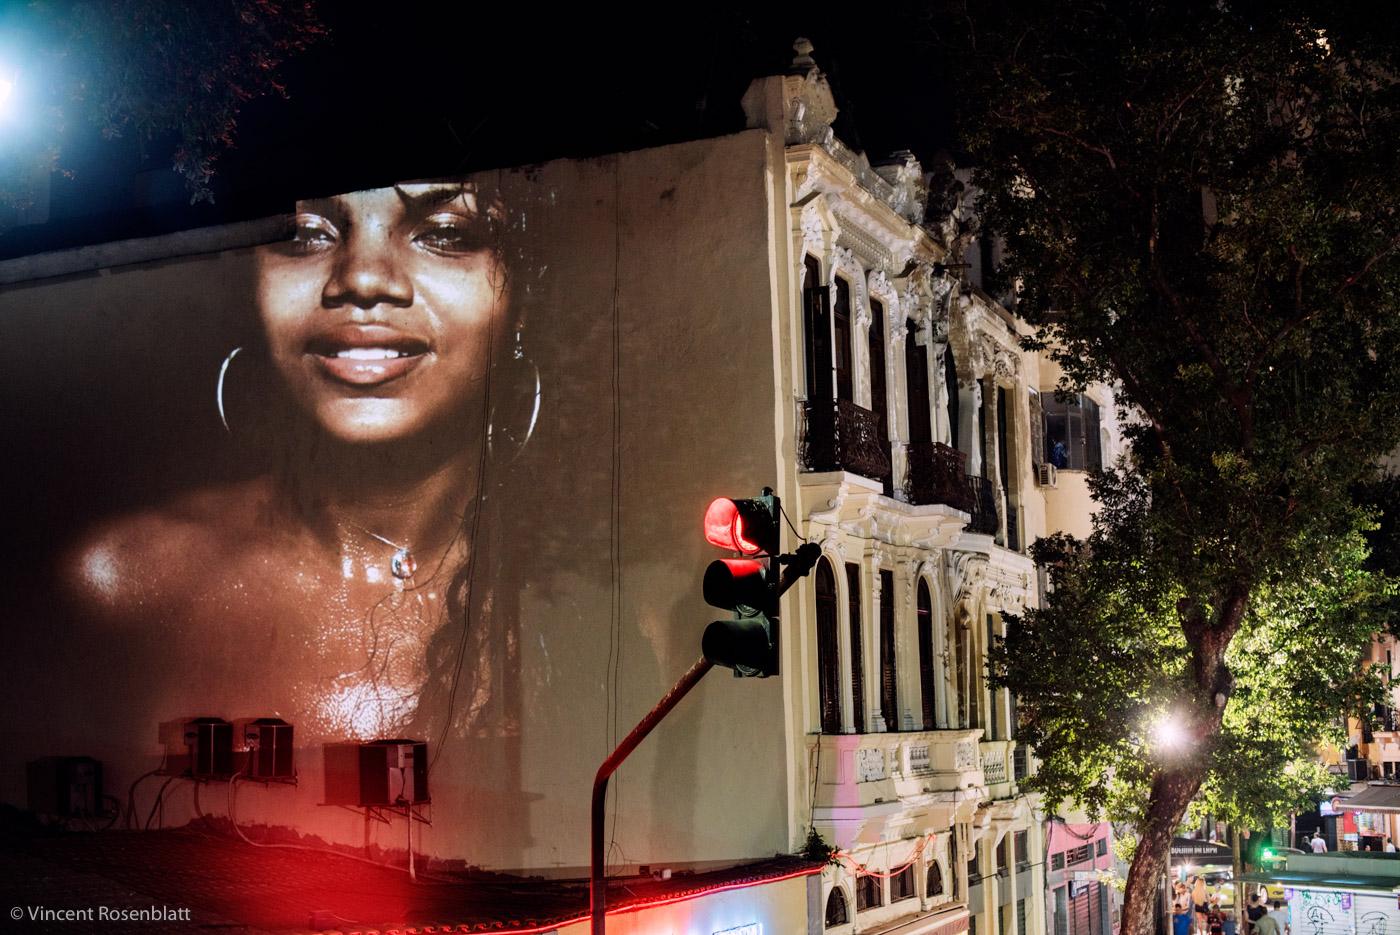 Slideshows - Rio Baile Funk